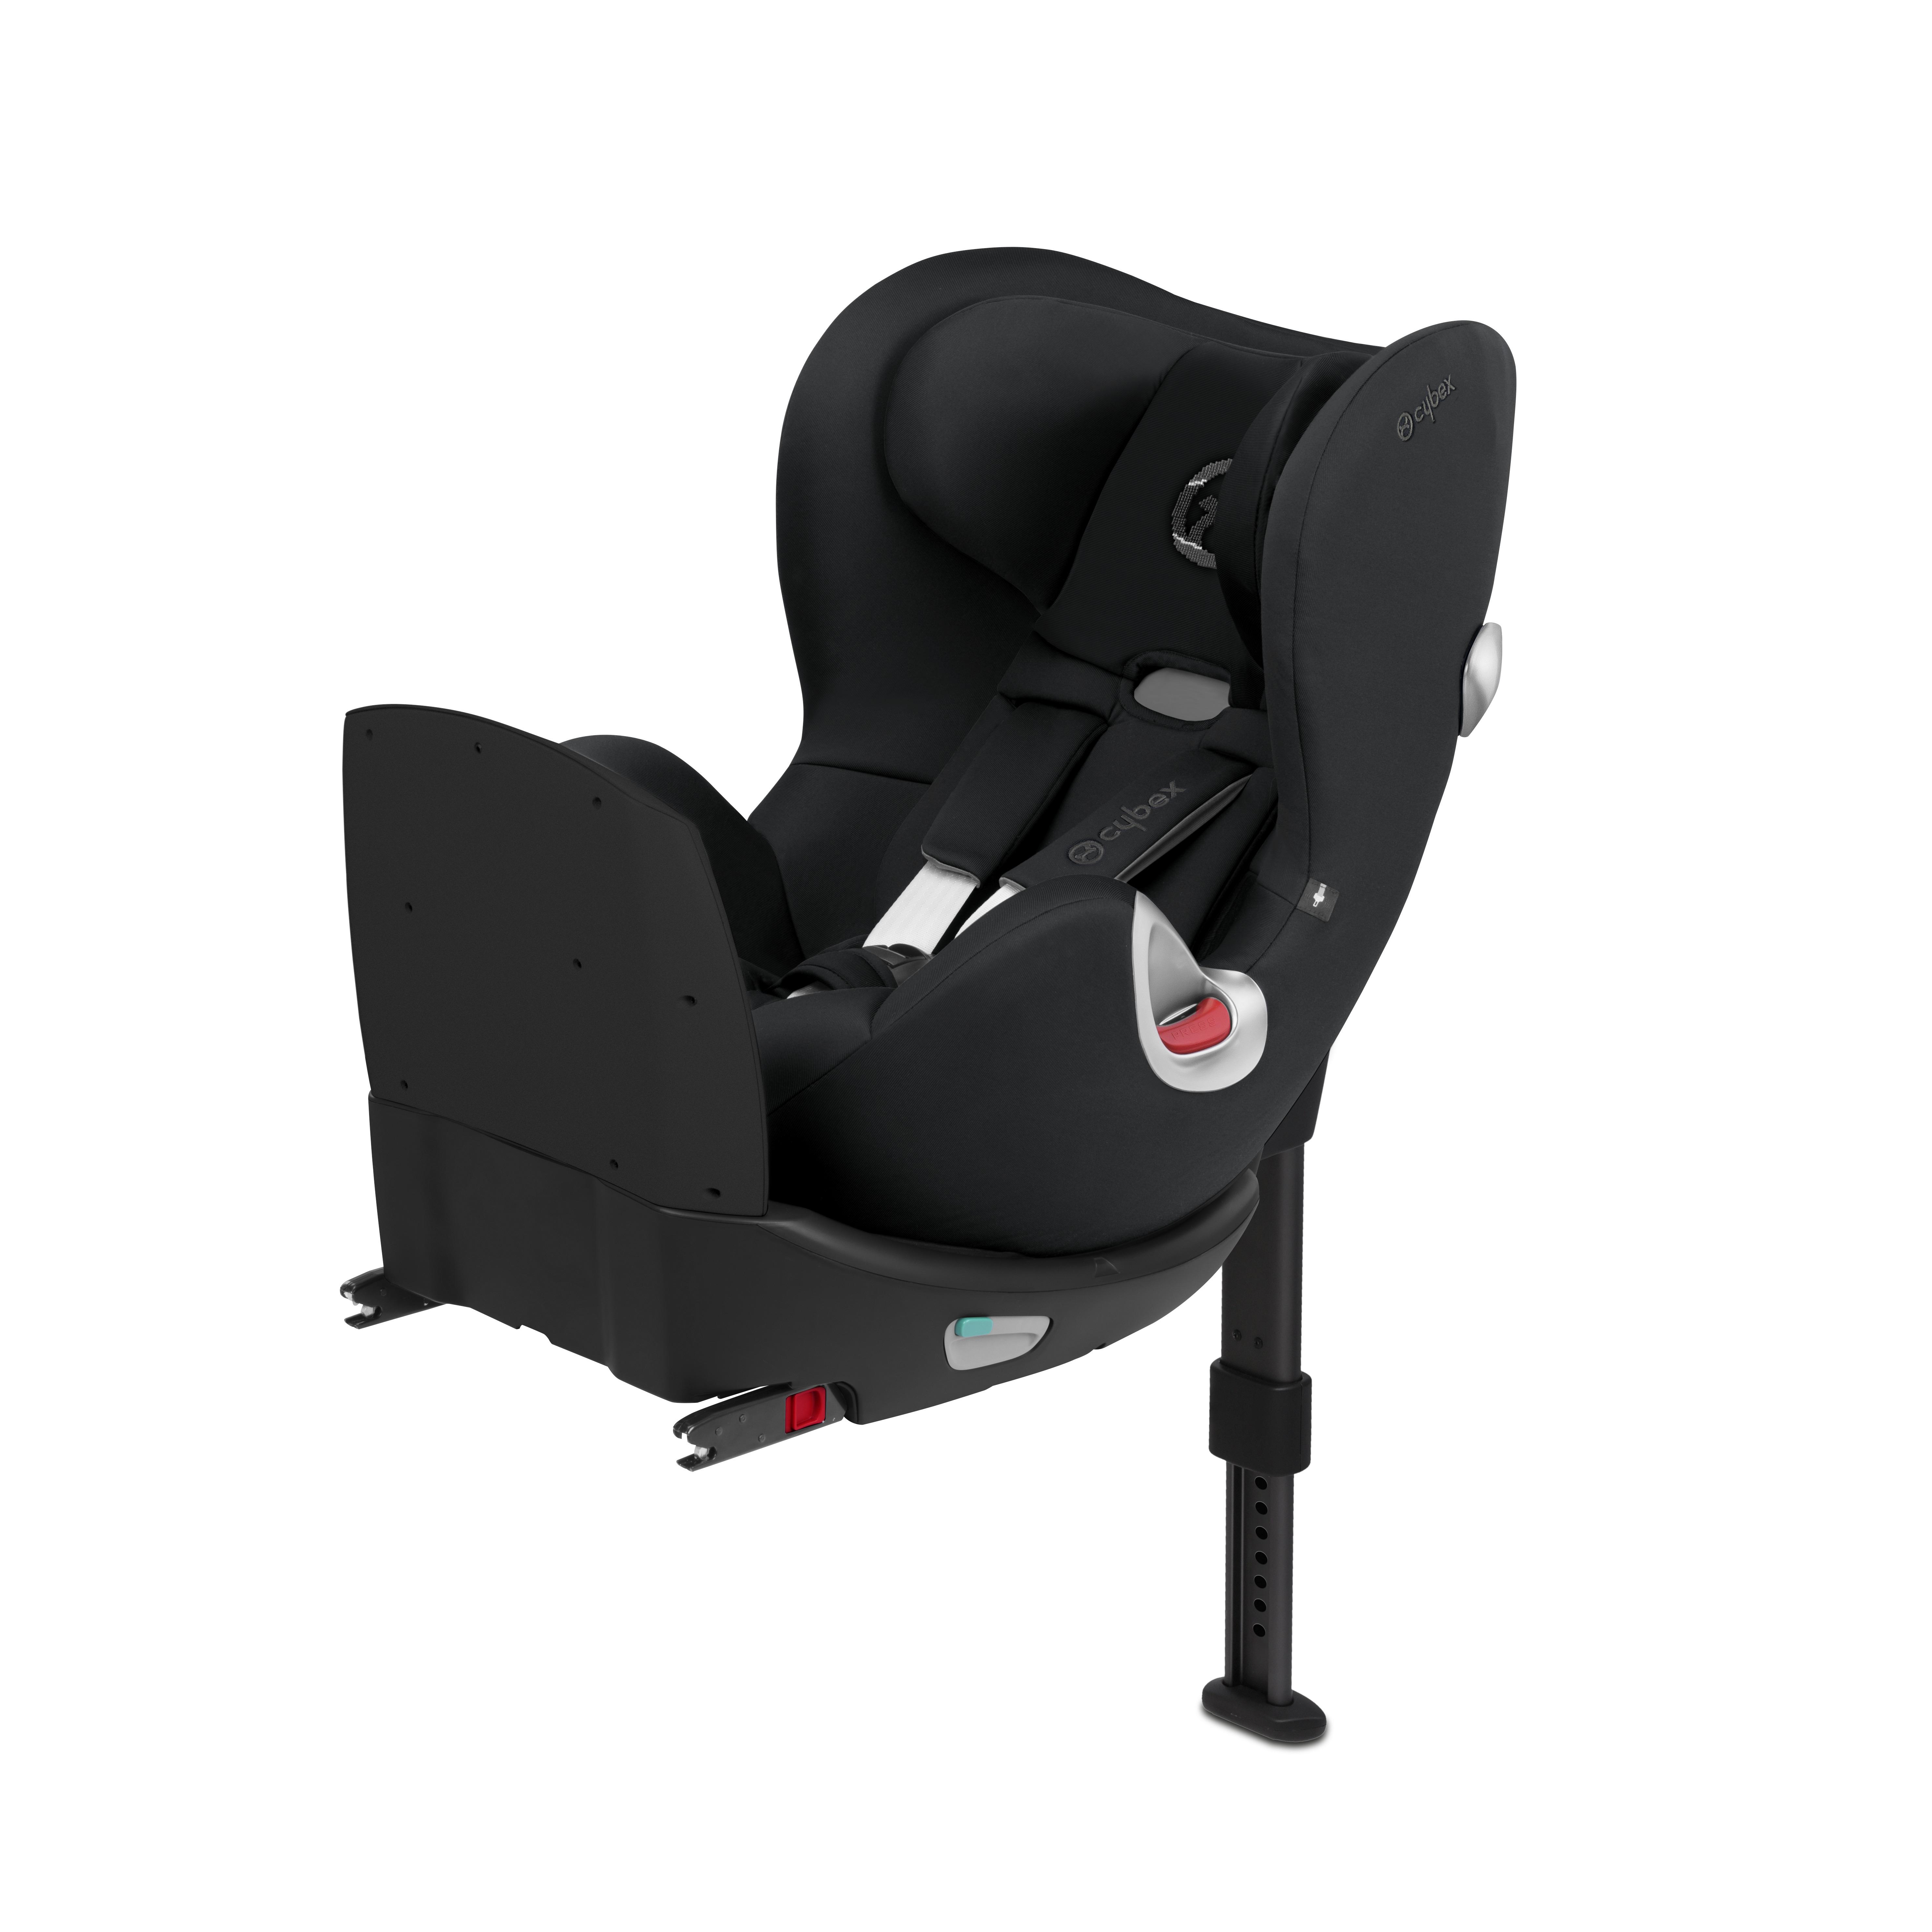 Автокресло Cybex Sirona Q I-Size черный автокресло cybex sirona m2 i size 0 18 кг manhattan grey